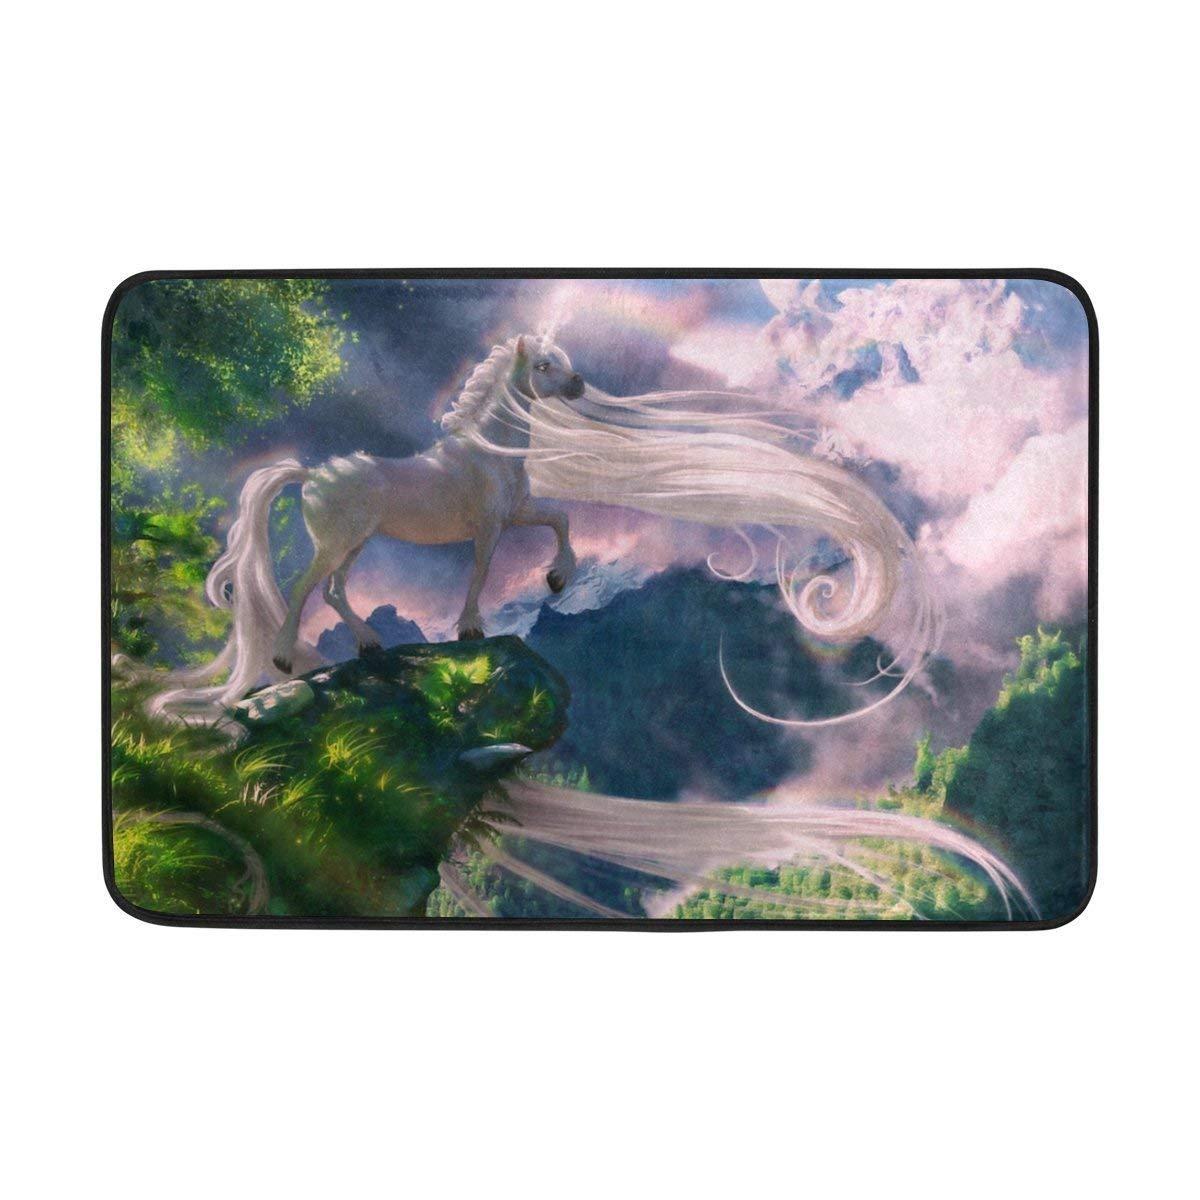 538 23.6x15.7,L x W LINGVYTE Carpet Rainbow Unicorn Doormat Entrance Mat Floor Mat Rug Indoor/Bathroom Mats Non Slip